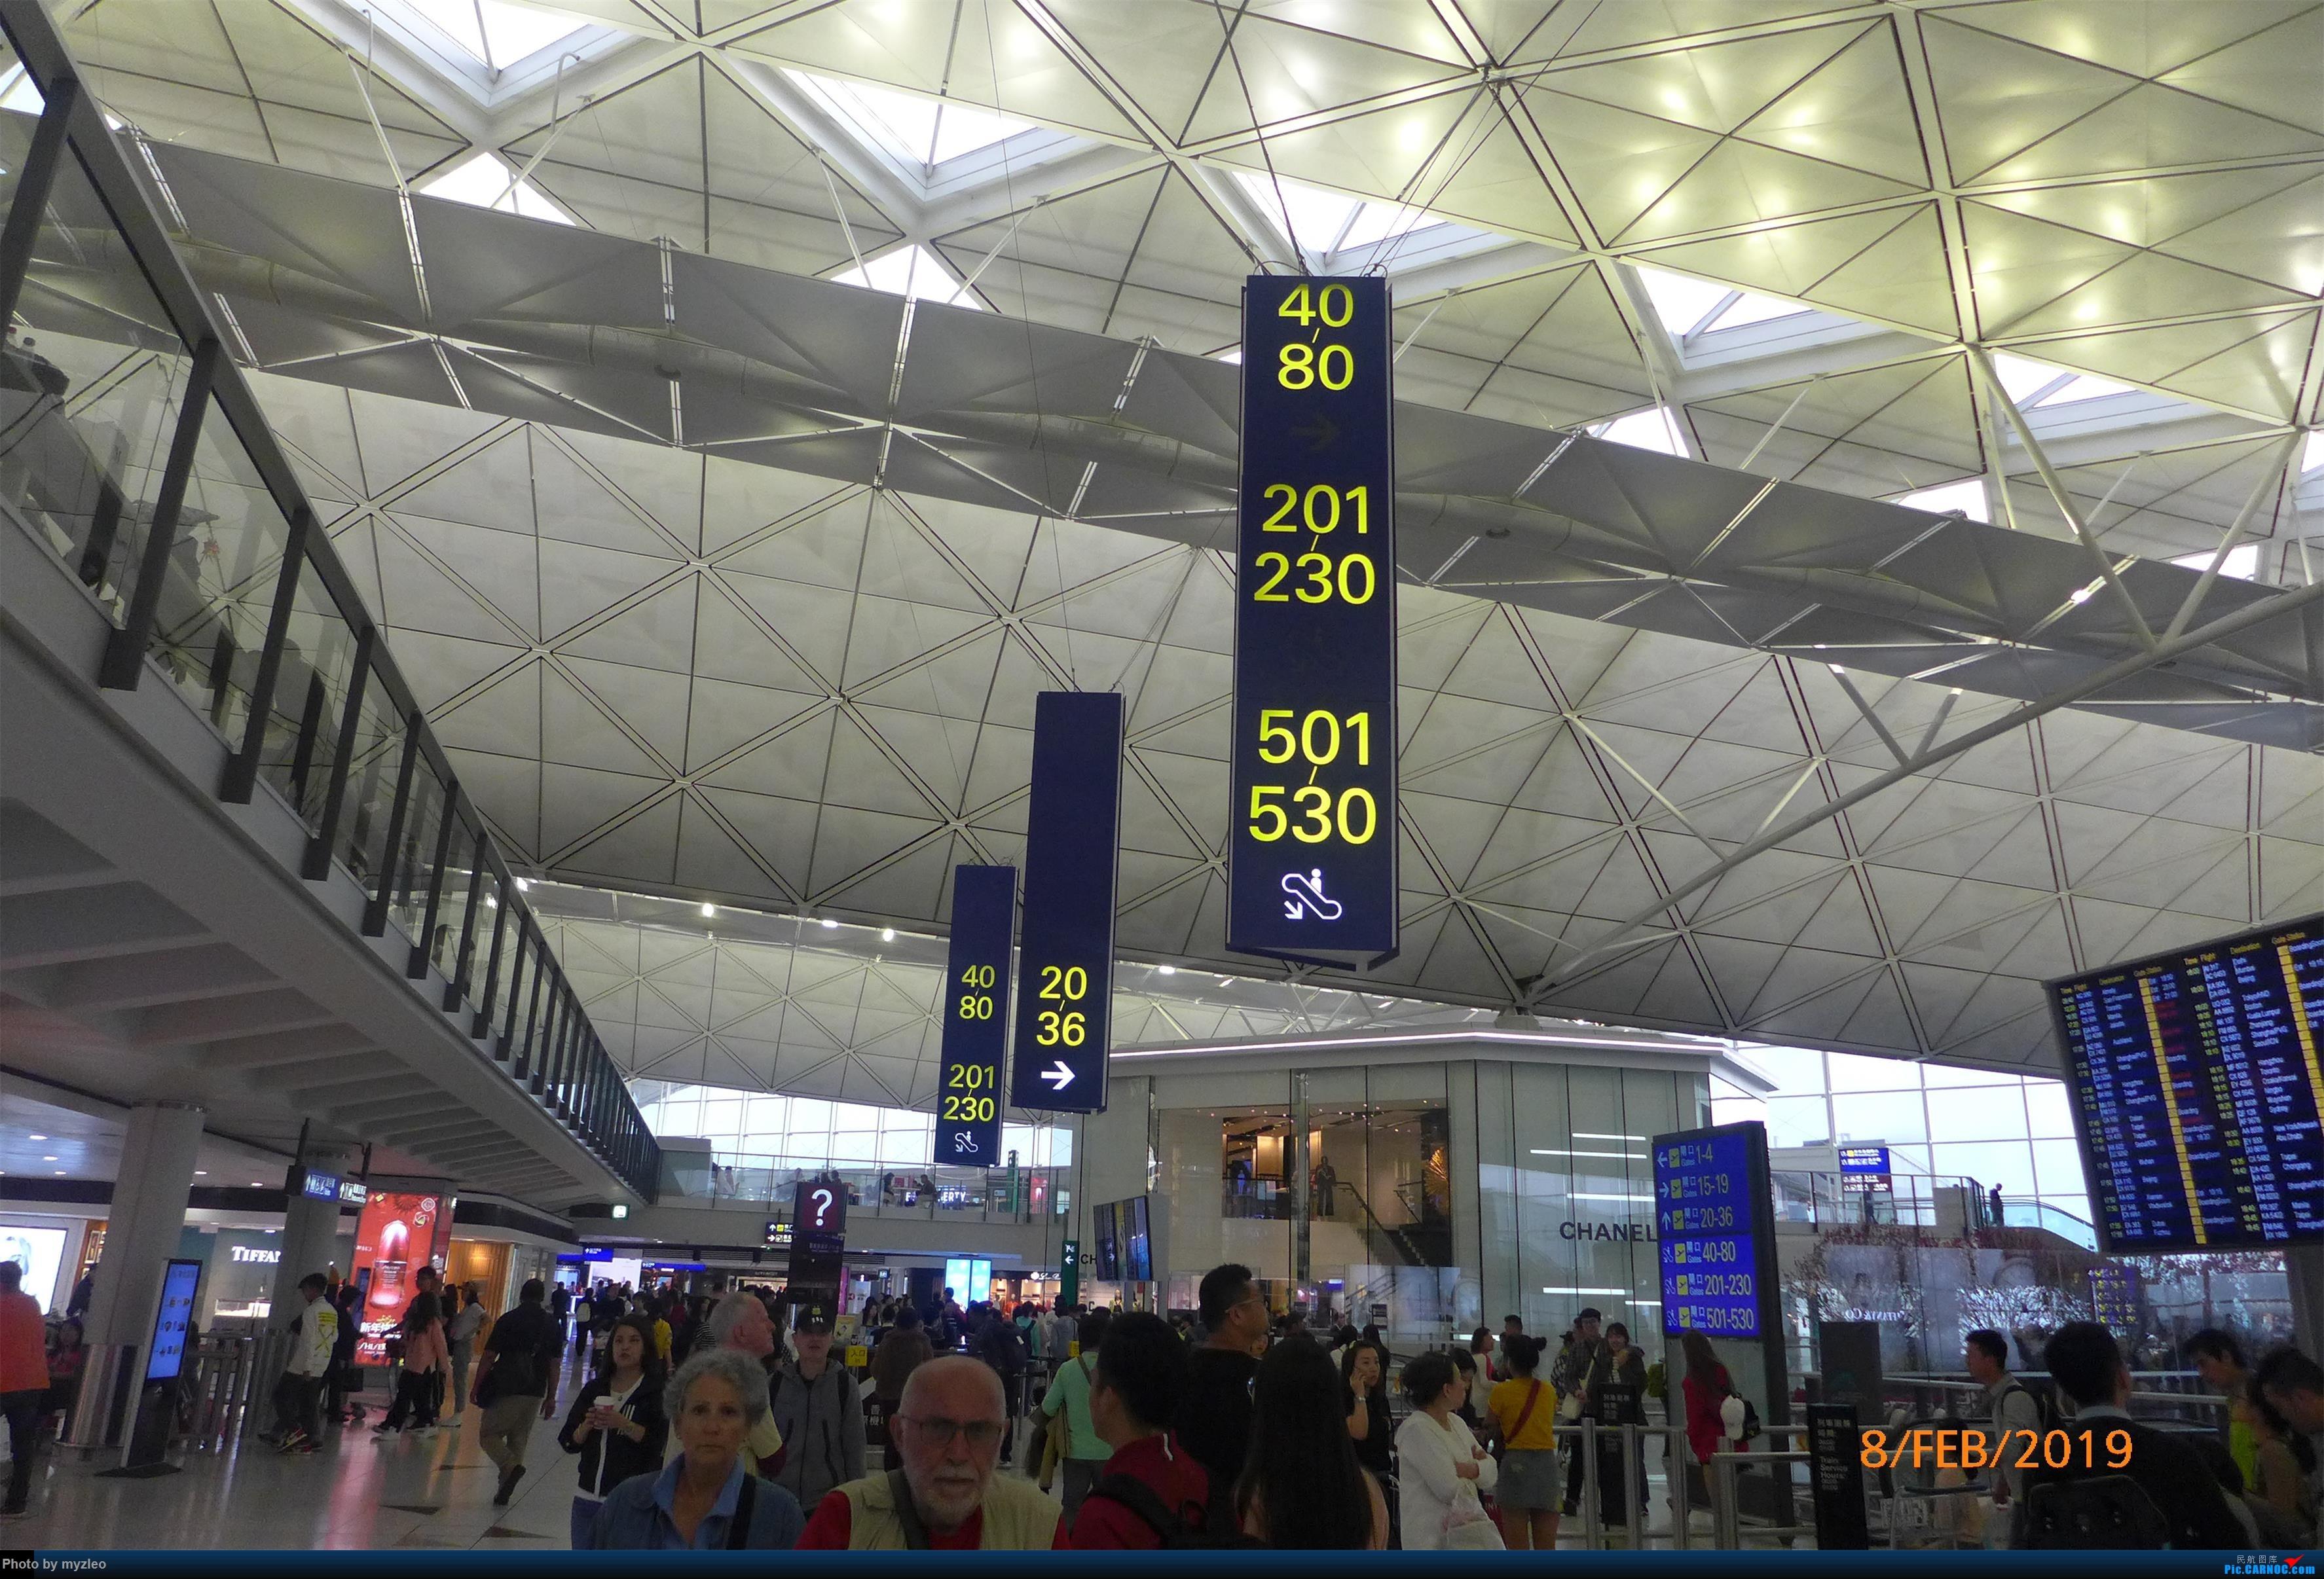 Re:[原创]【myzleo的游记4.5】十年之约(5)在香港的最后一天,搭乘港航333回沪 BOEING 777-300ER HL8042 中国香港国际机场 中国香港国际机场